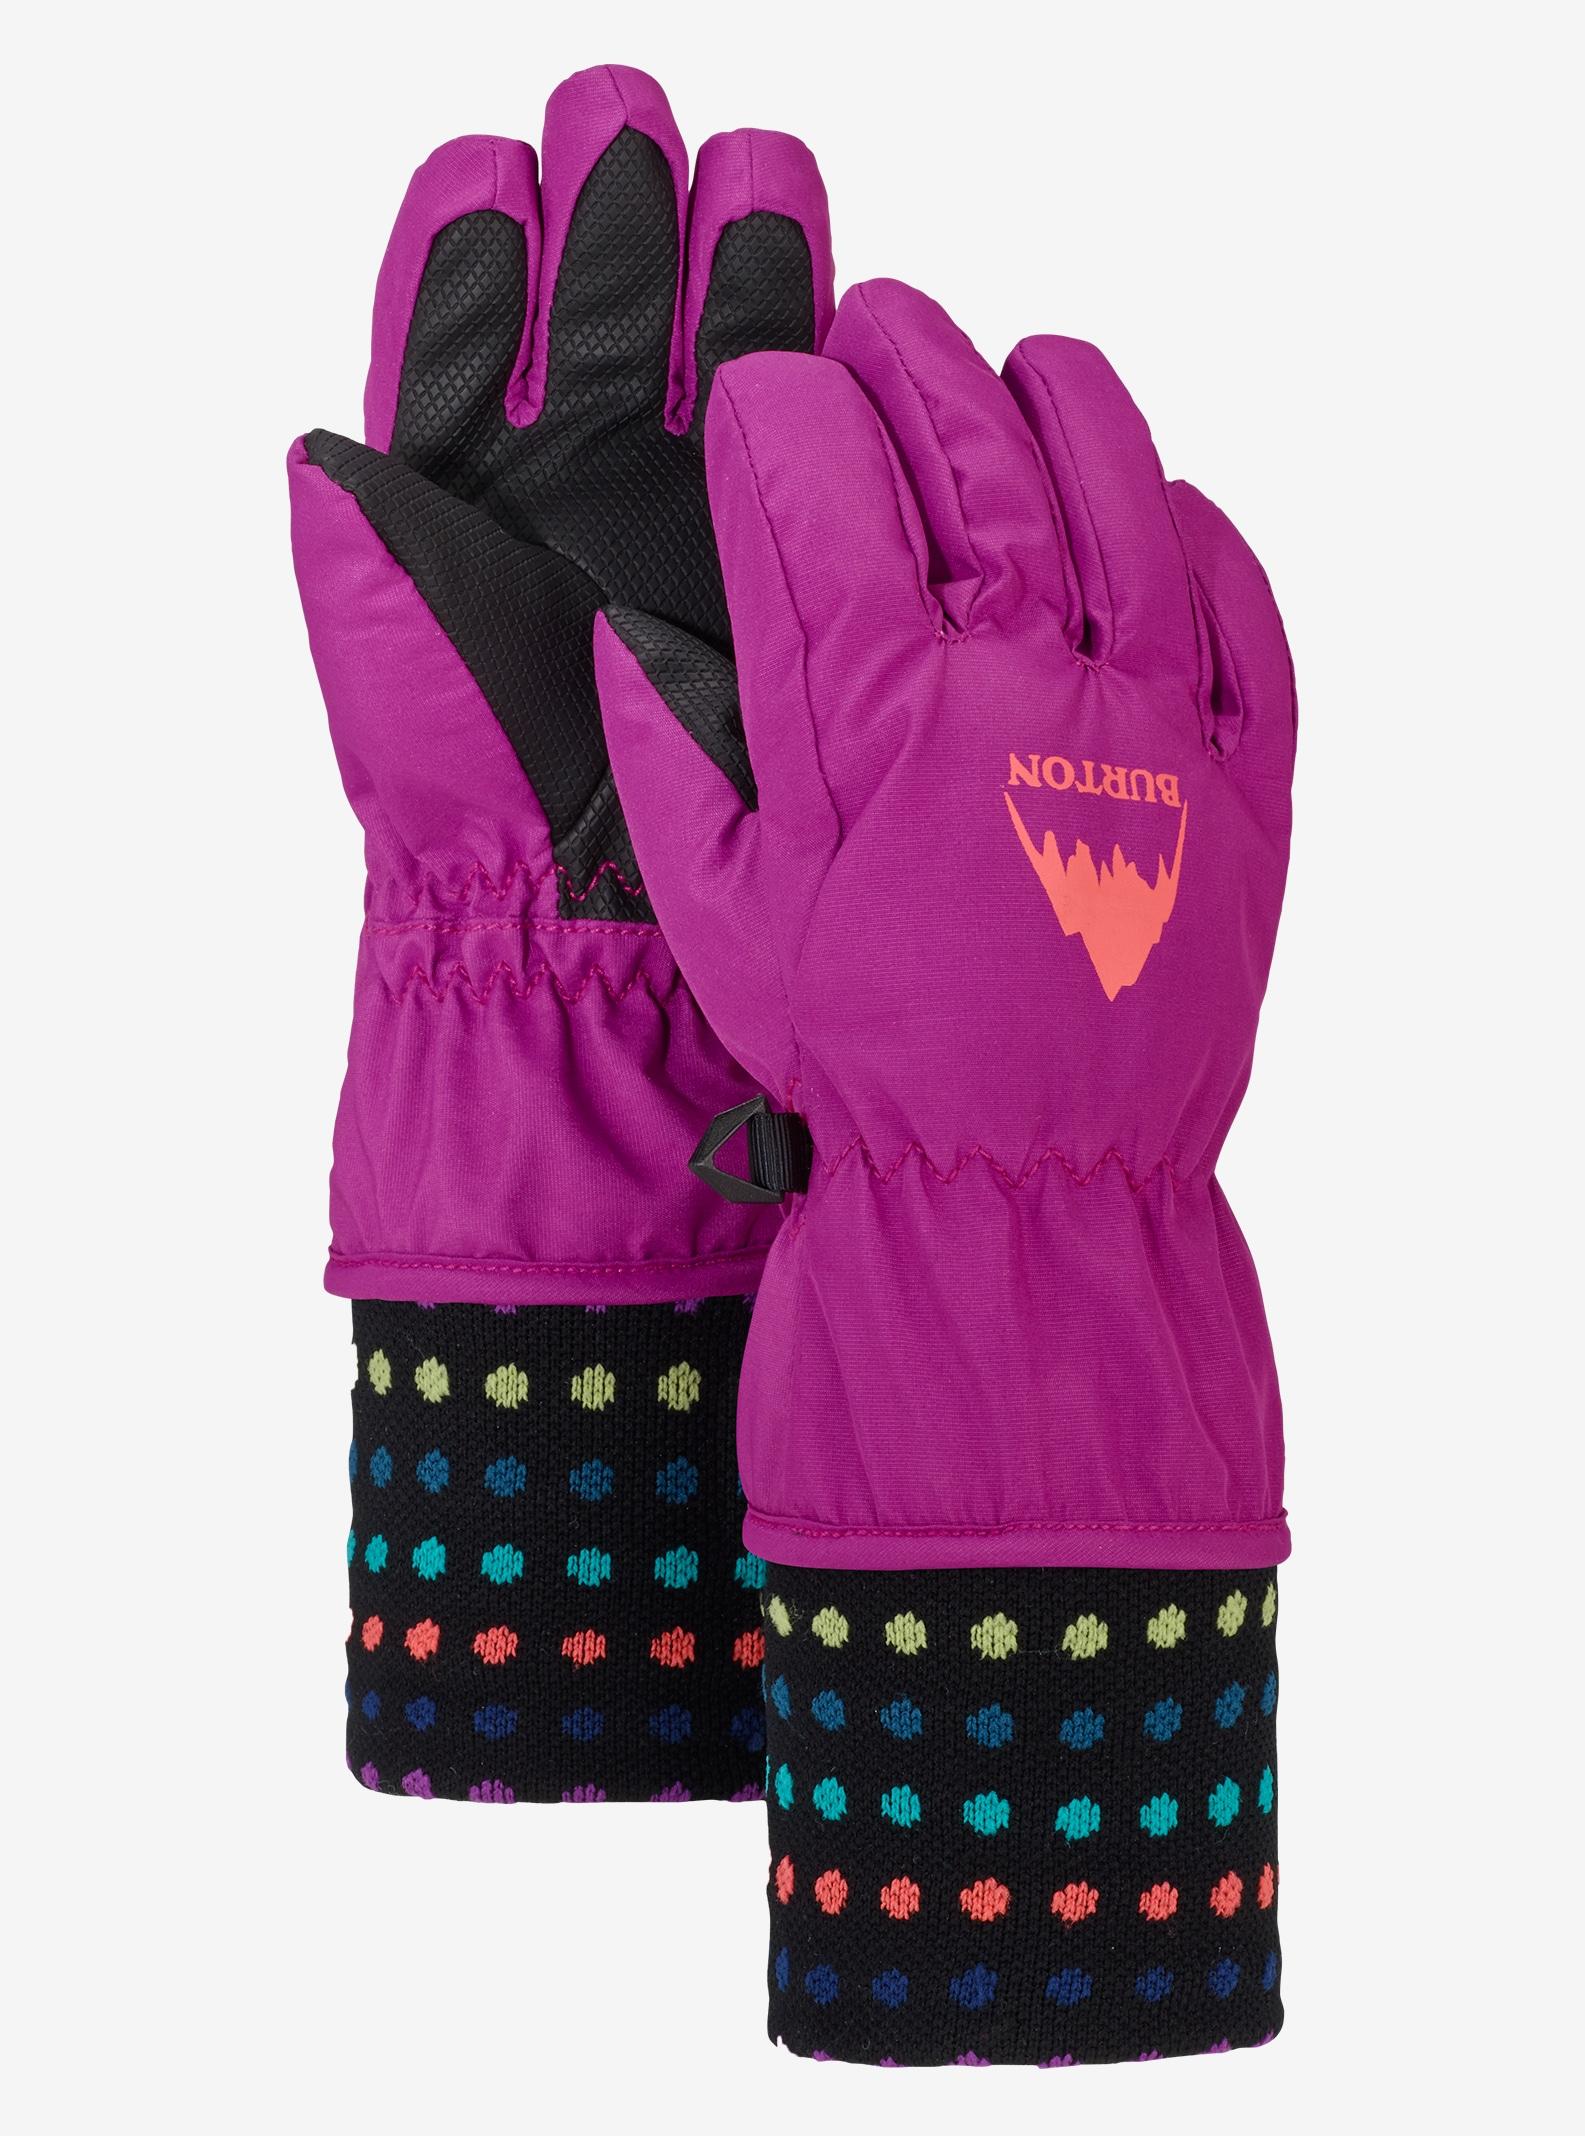 Kids' Burton Minishred Glove shown in Grapeseed